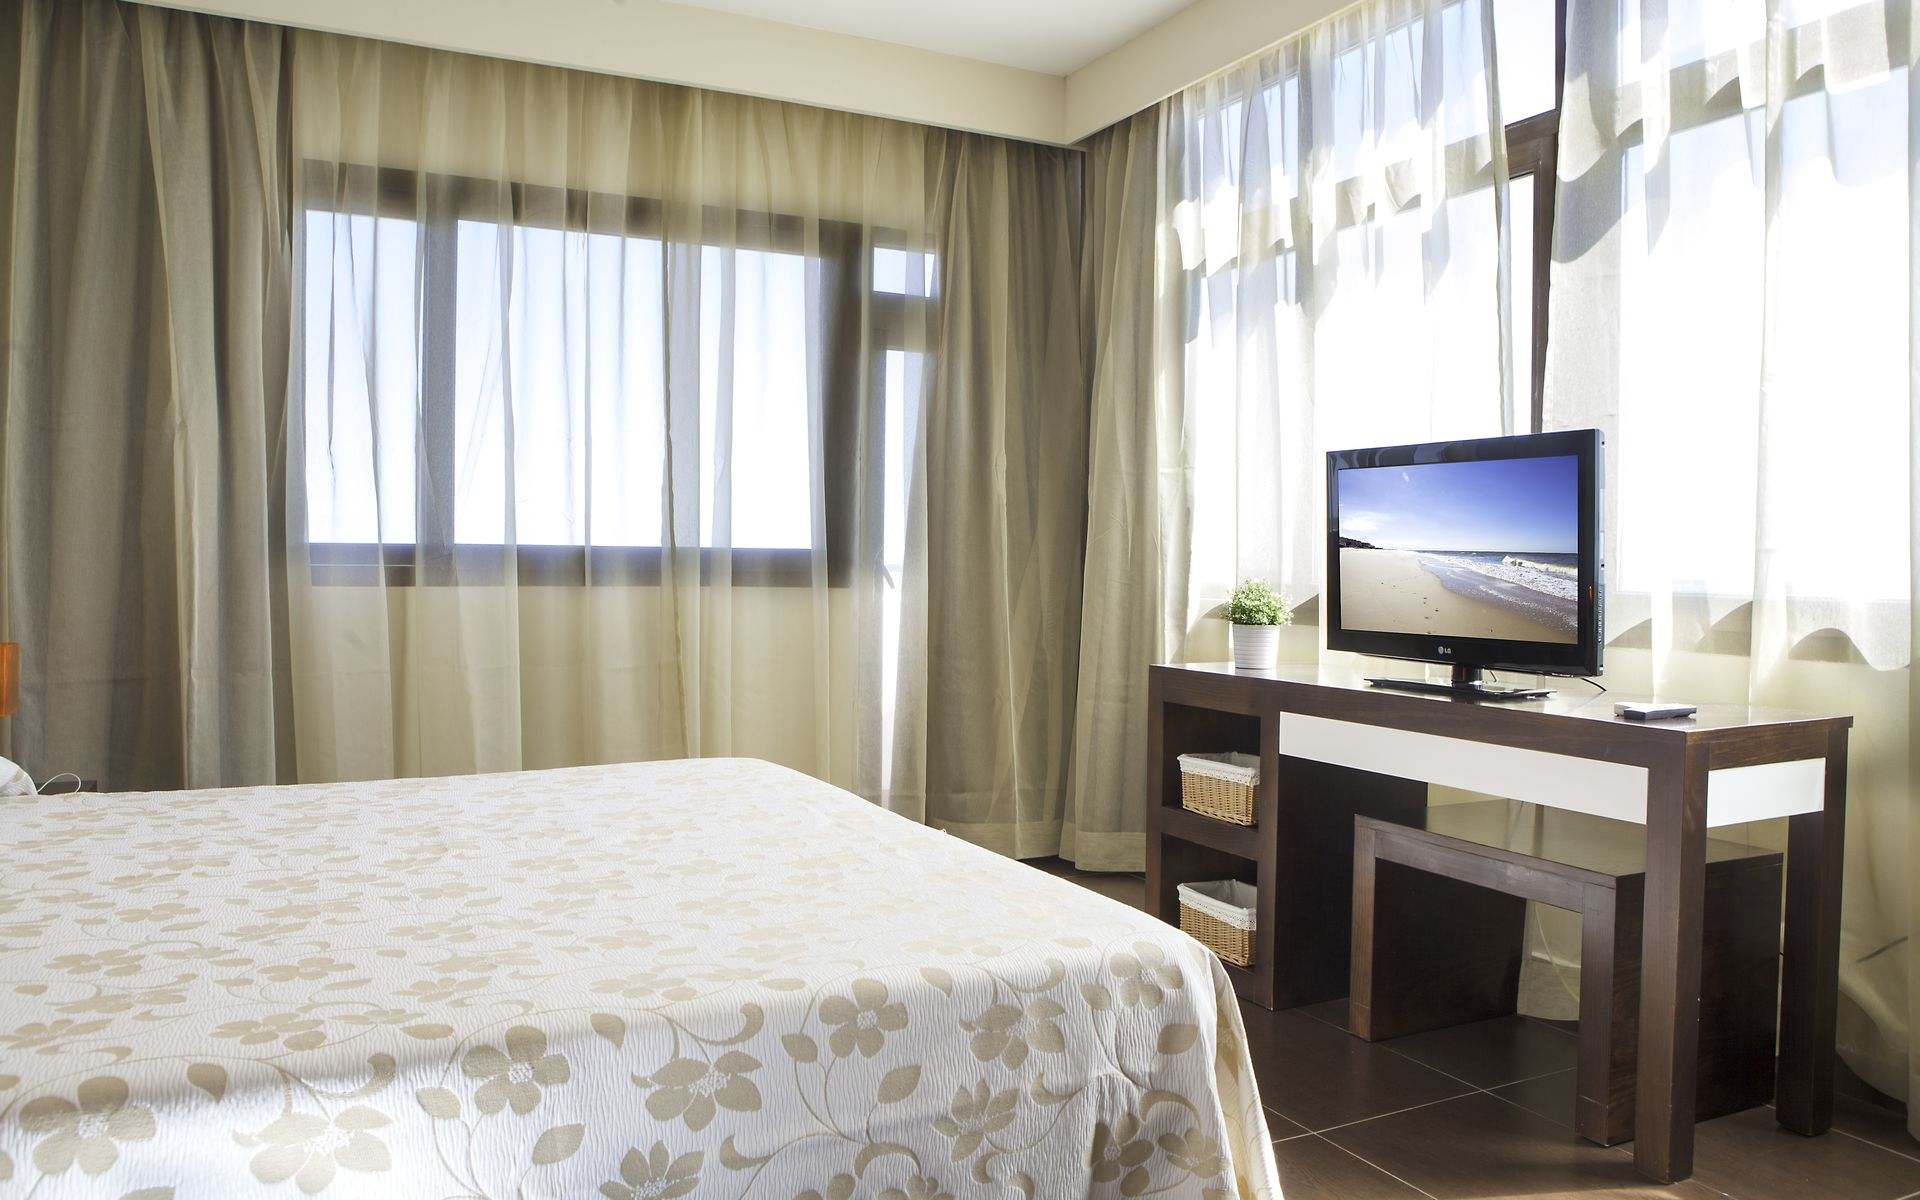 Hotel flamero en matalasca as costa de la luz huelva - Television pequena plana ...